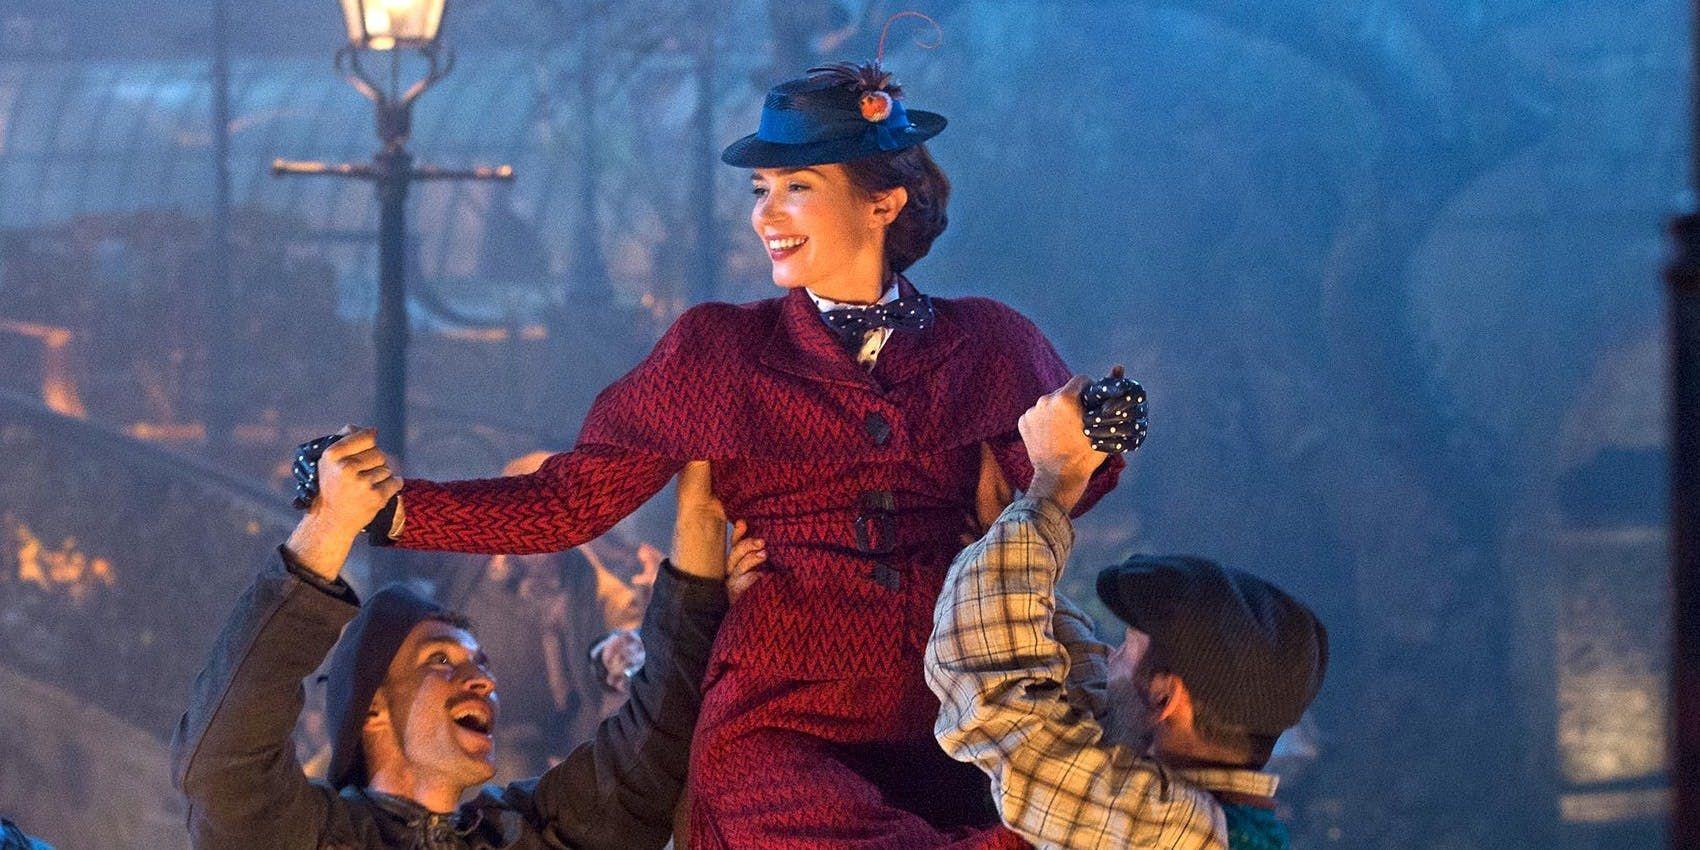 mary poppins returns emily blunt julie andrews